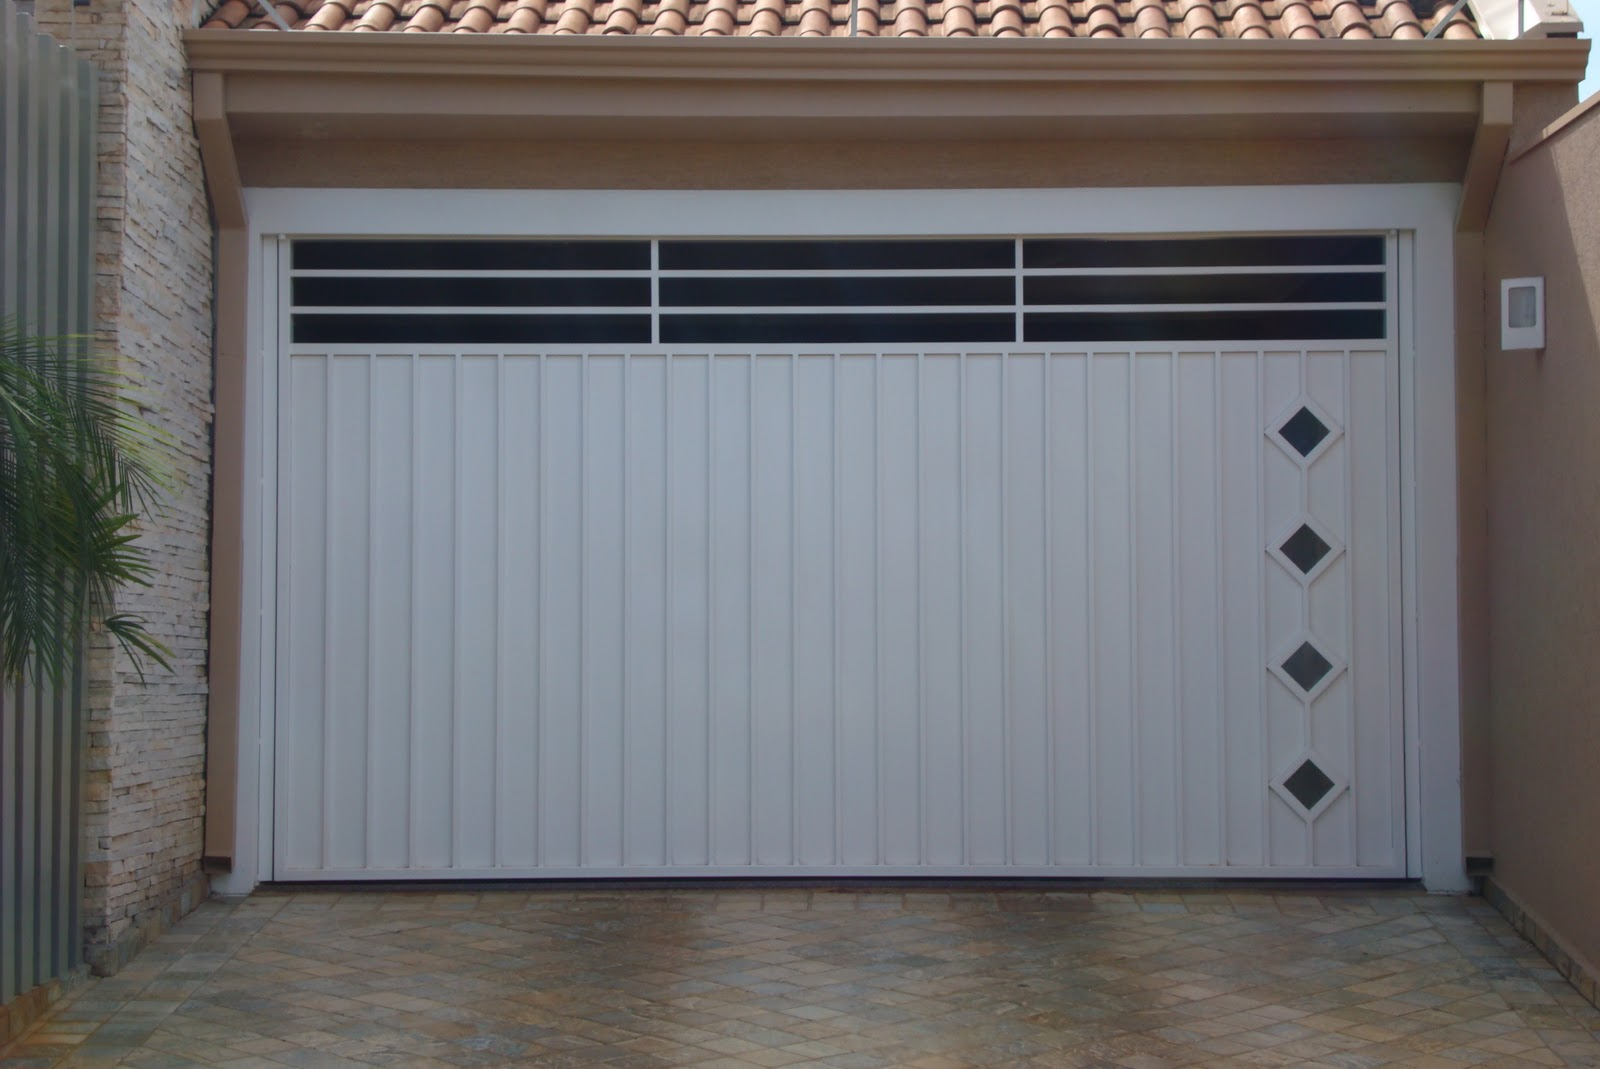 modelos de portoes de garagem 3